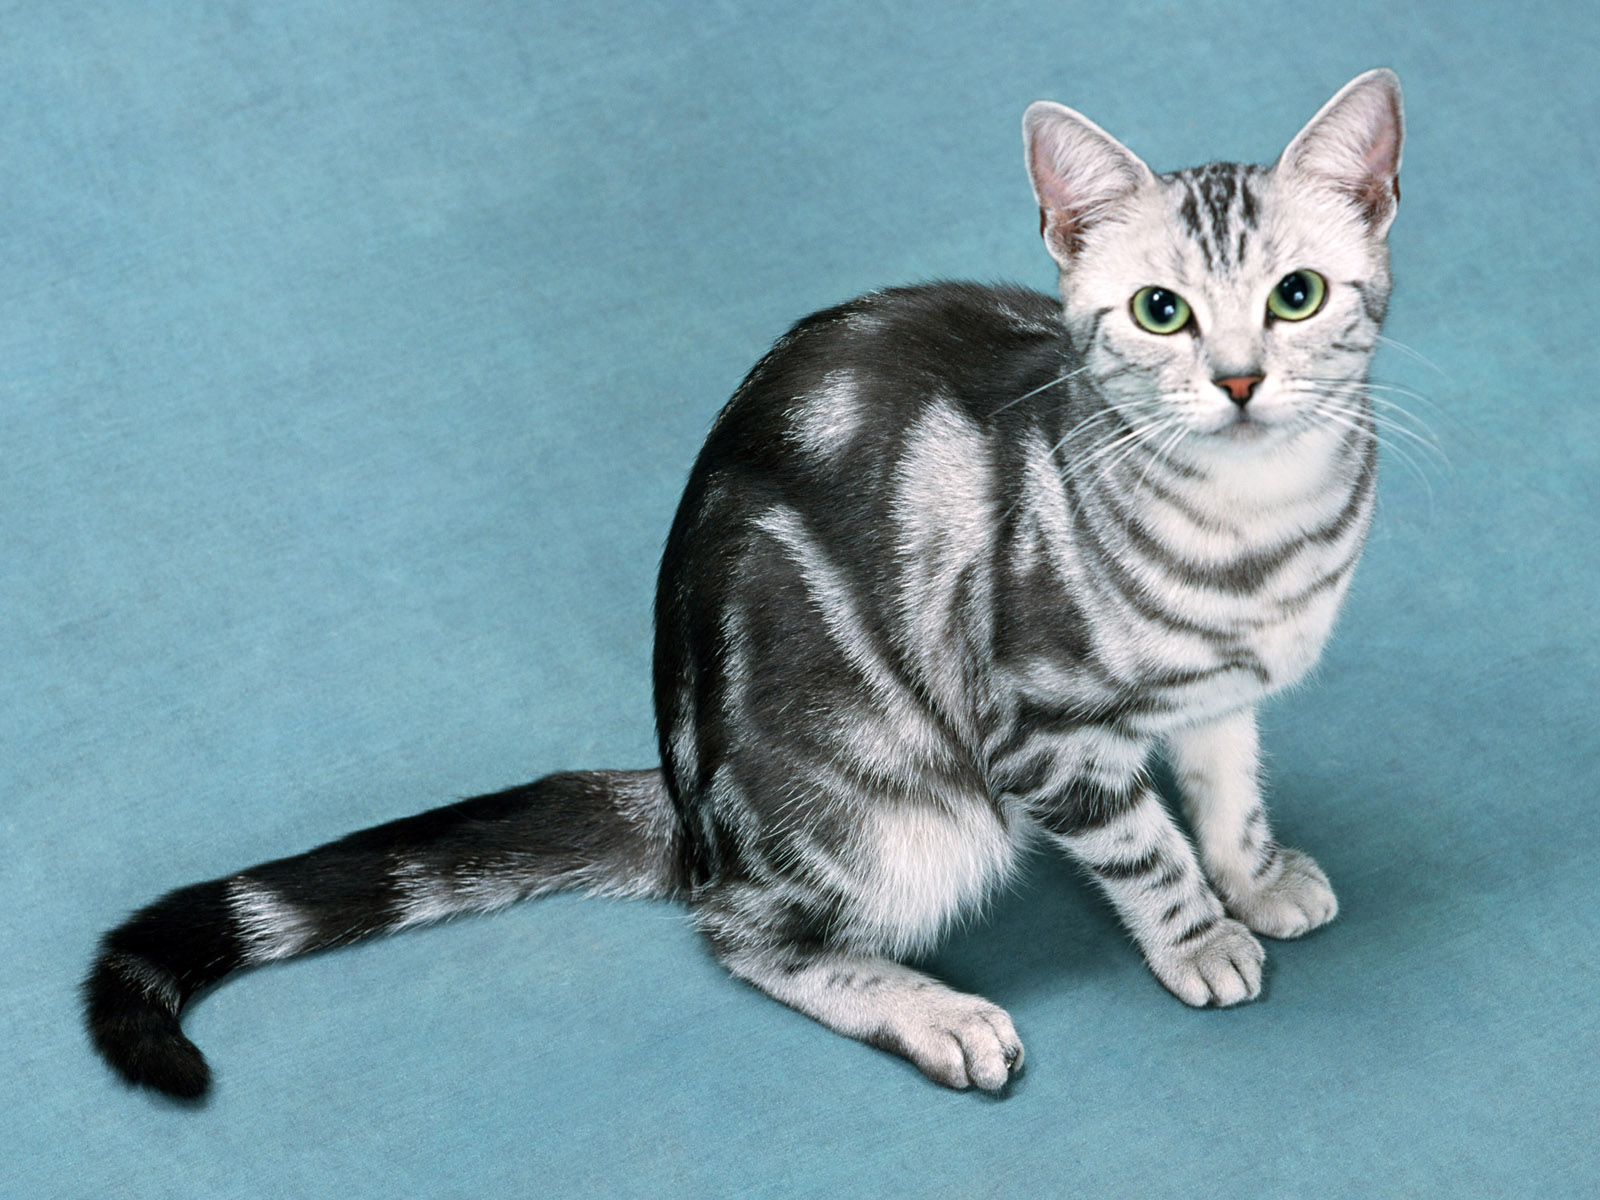 Коты и кошки из балета коты в сапогах - e61